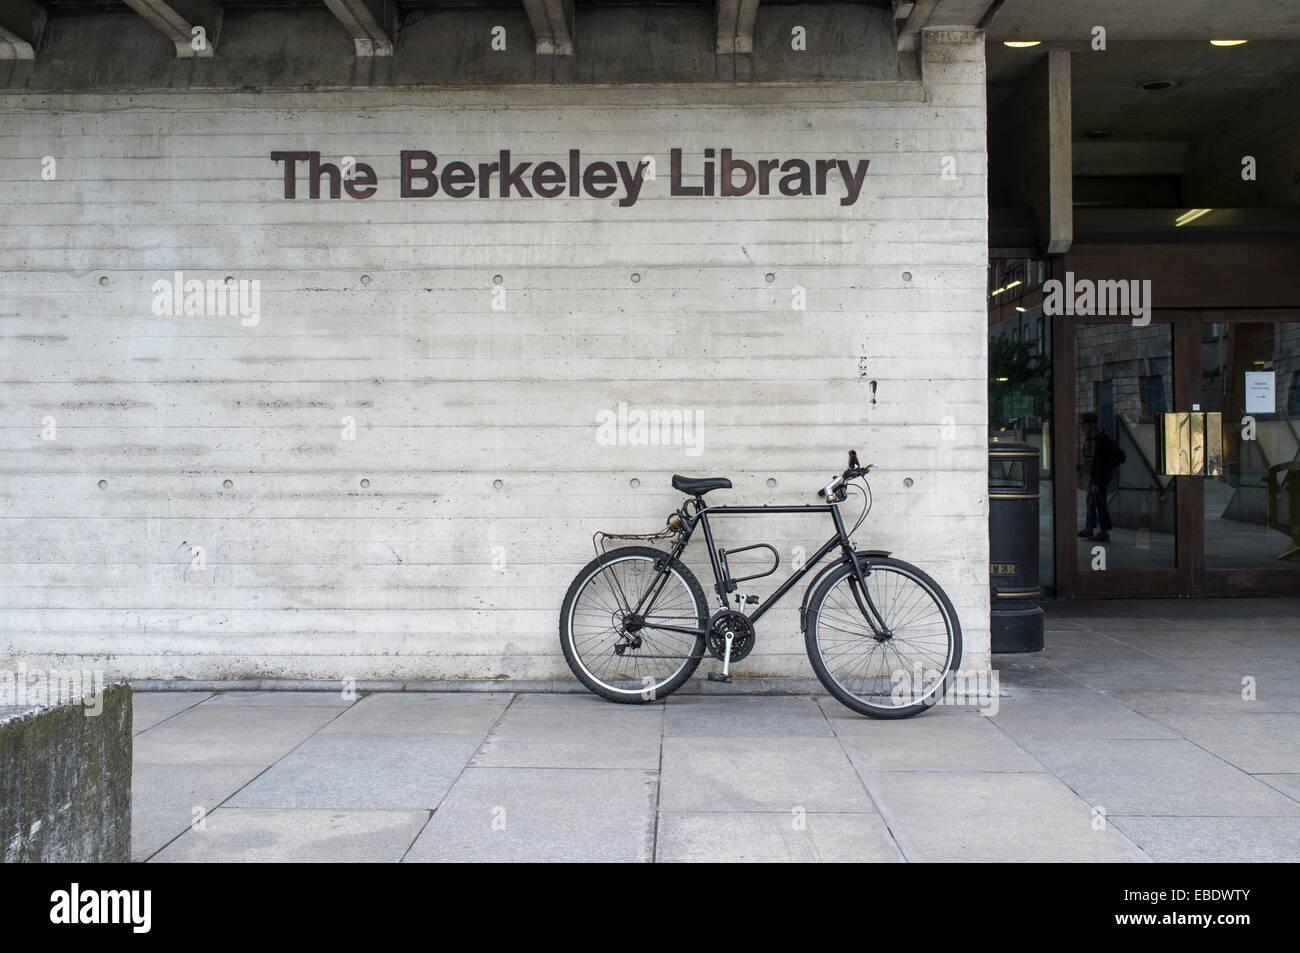 The Berkeley Library Trinity College Dublin Ireland Stock Photo